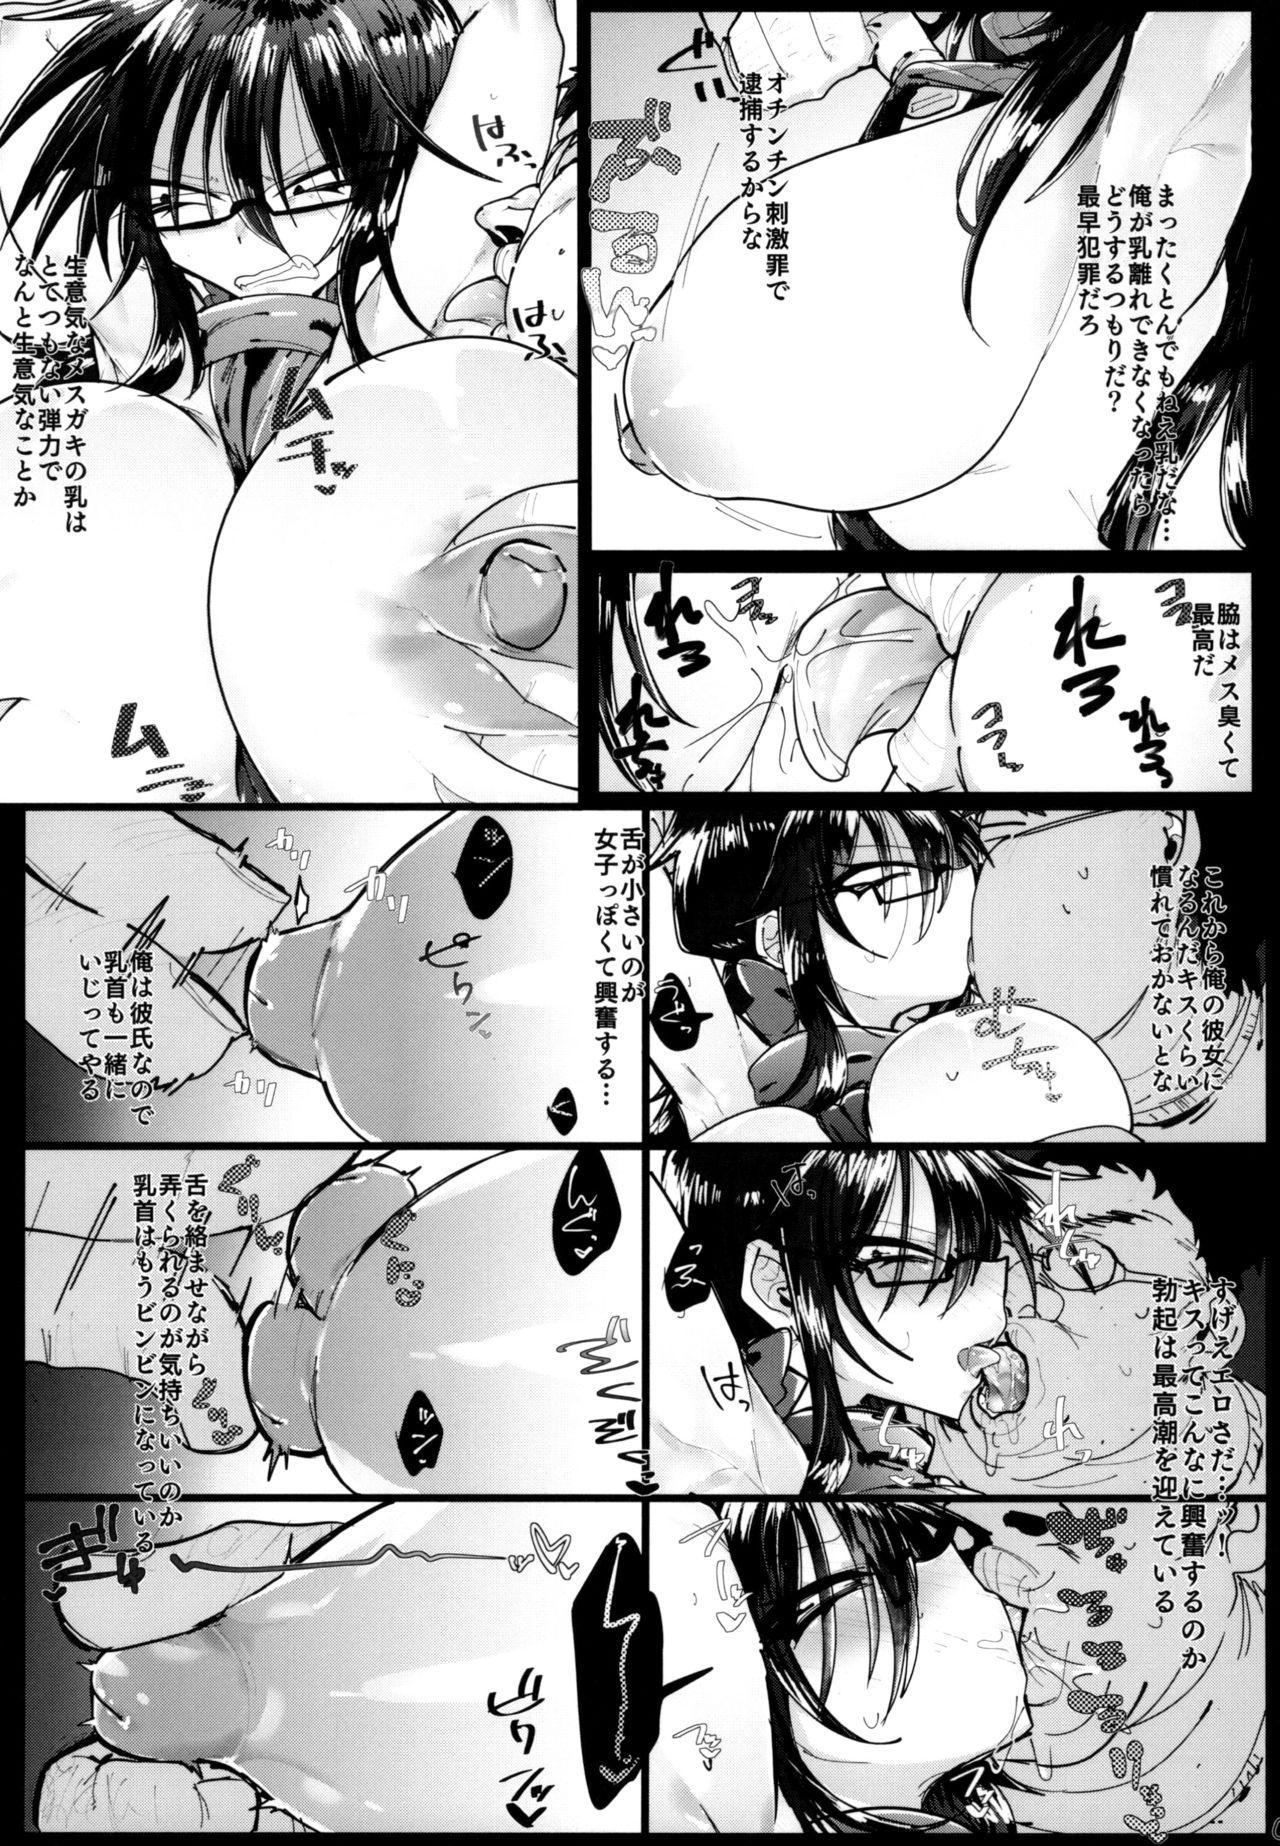 Kurokami Sanpakugan Megane Danshi TS Kyousei Fukujuu Fuck 10